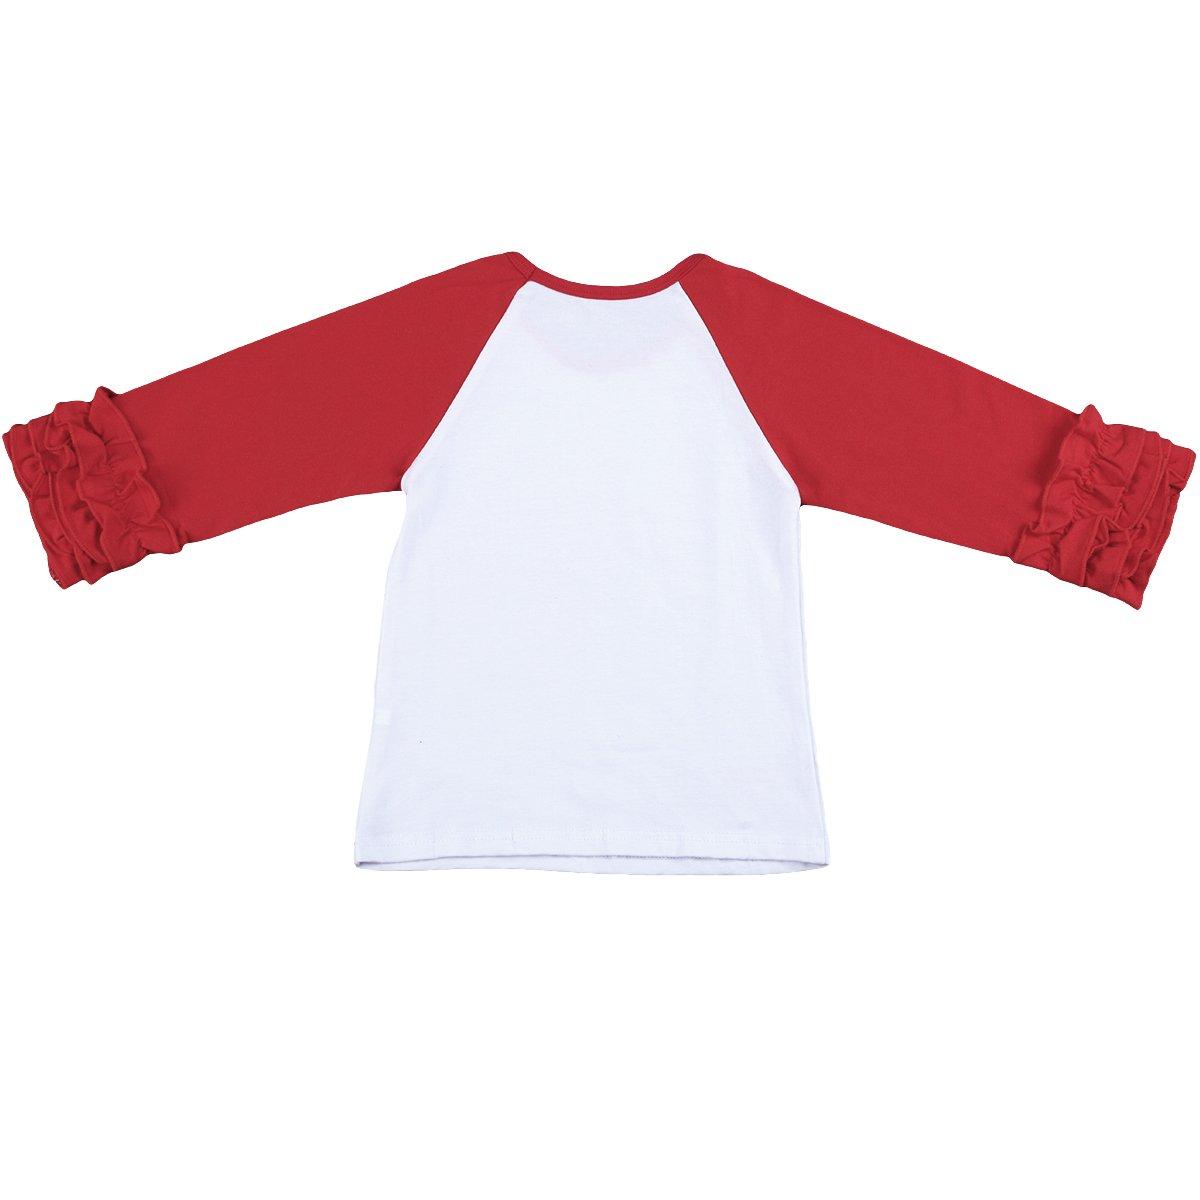 Baby Kid Girl Icing Ruffle Tops Raglan T-Shirt Long Sleeve Tee Shirt Casual Clothes